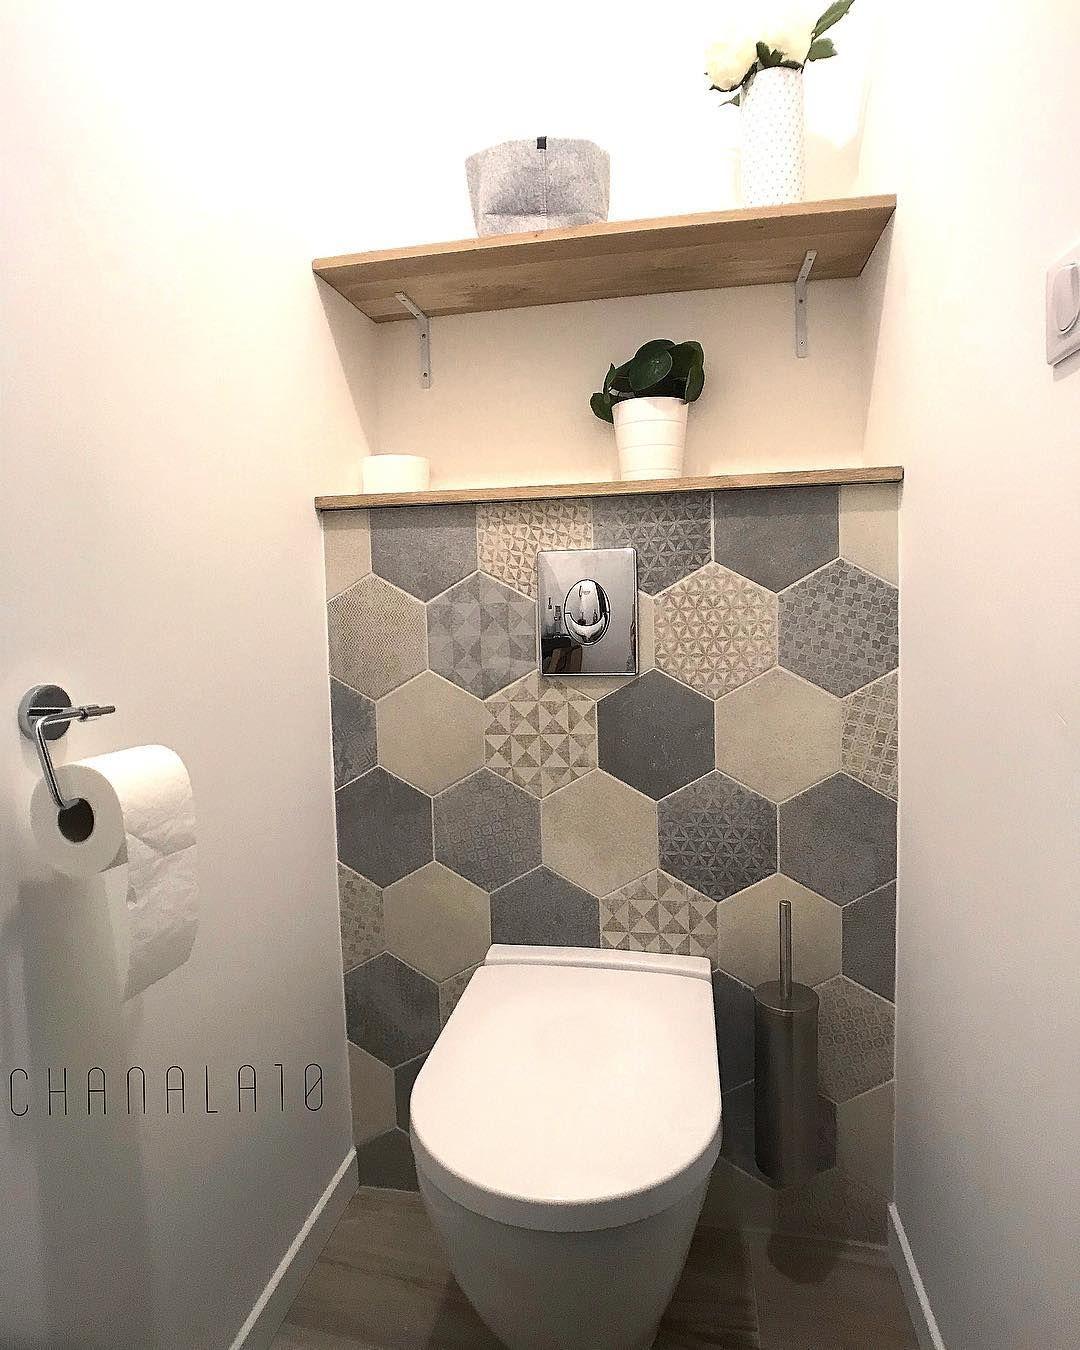 Carrelage Toilettes Relooking Toilettes Decoration Toilettes Idee Deco Toilettes